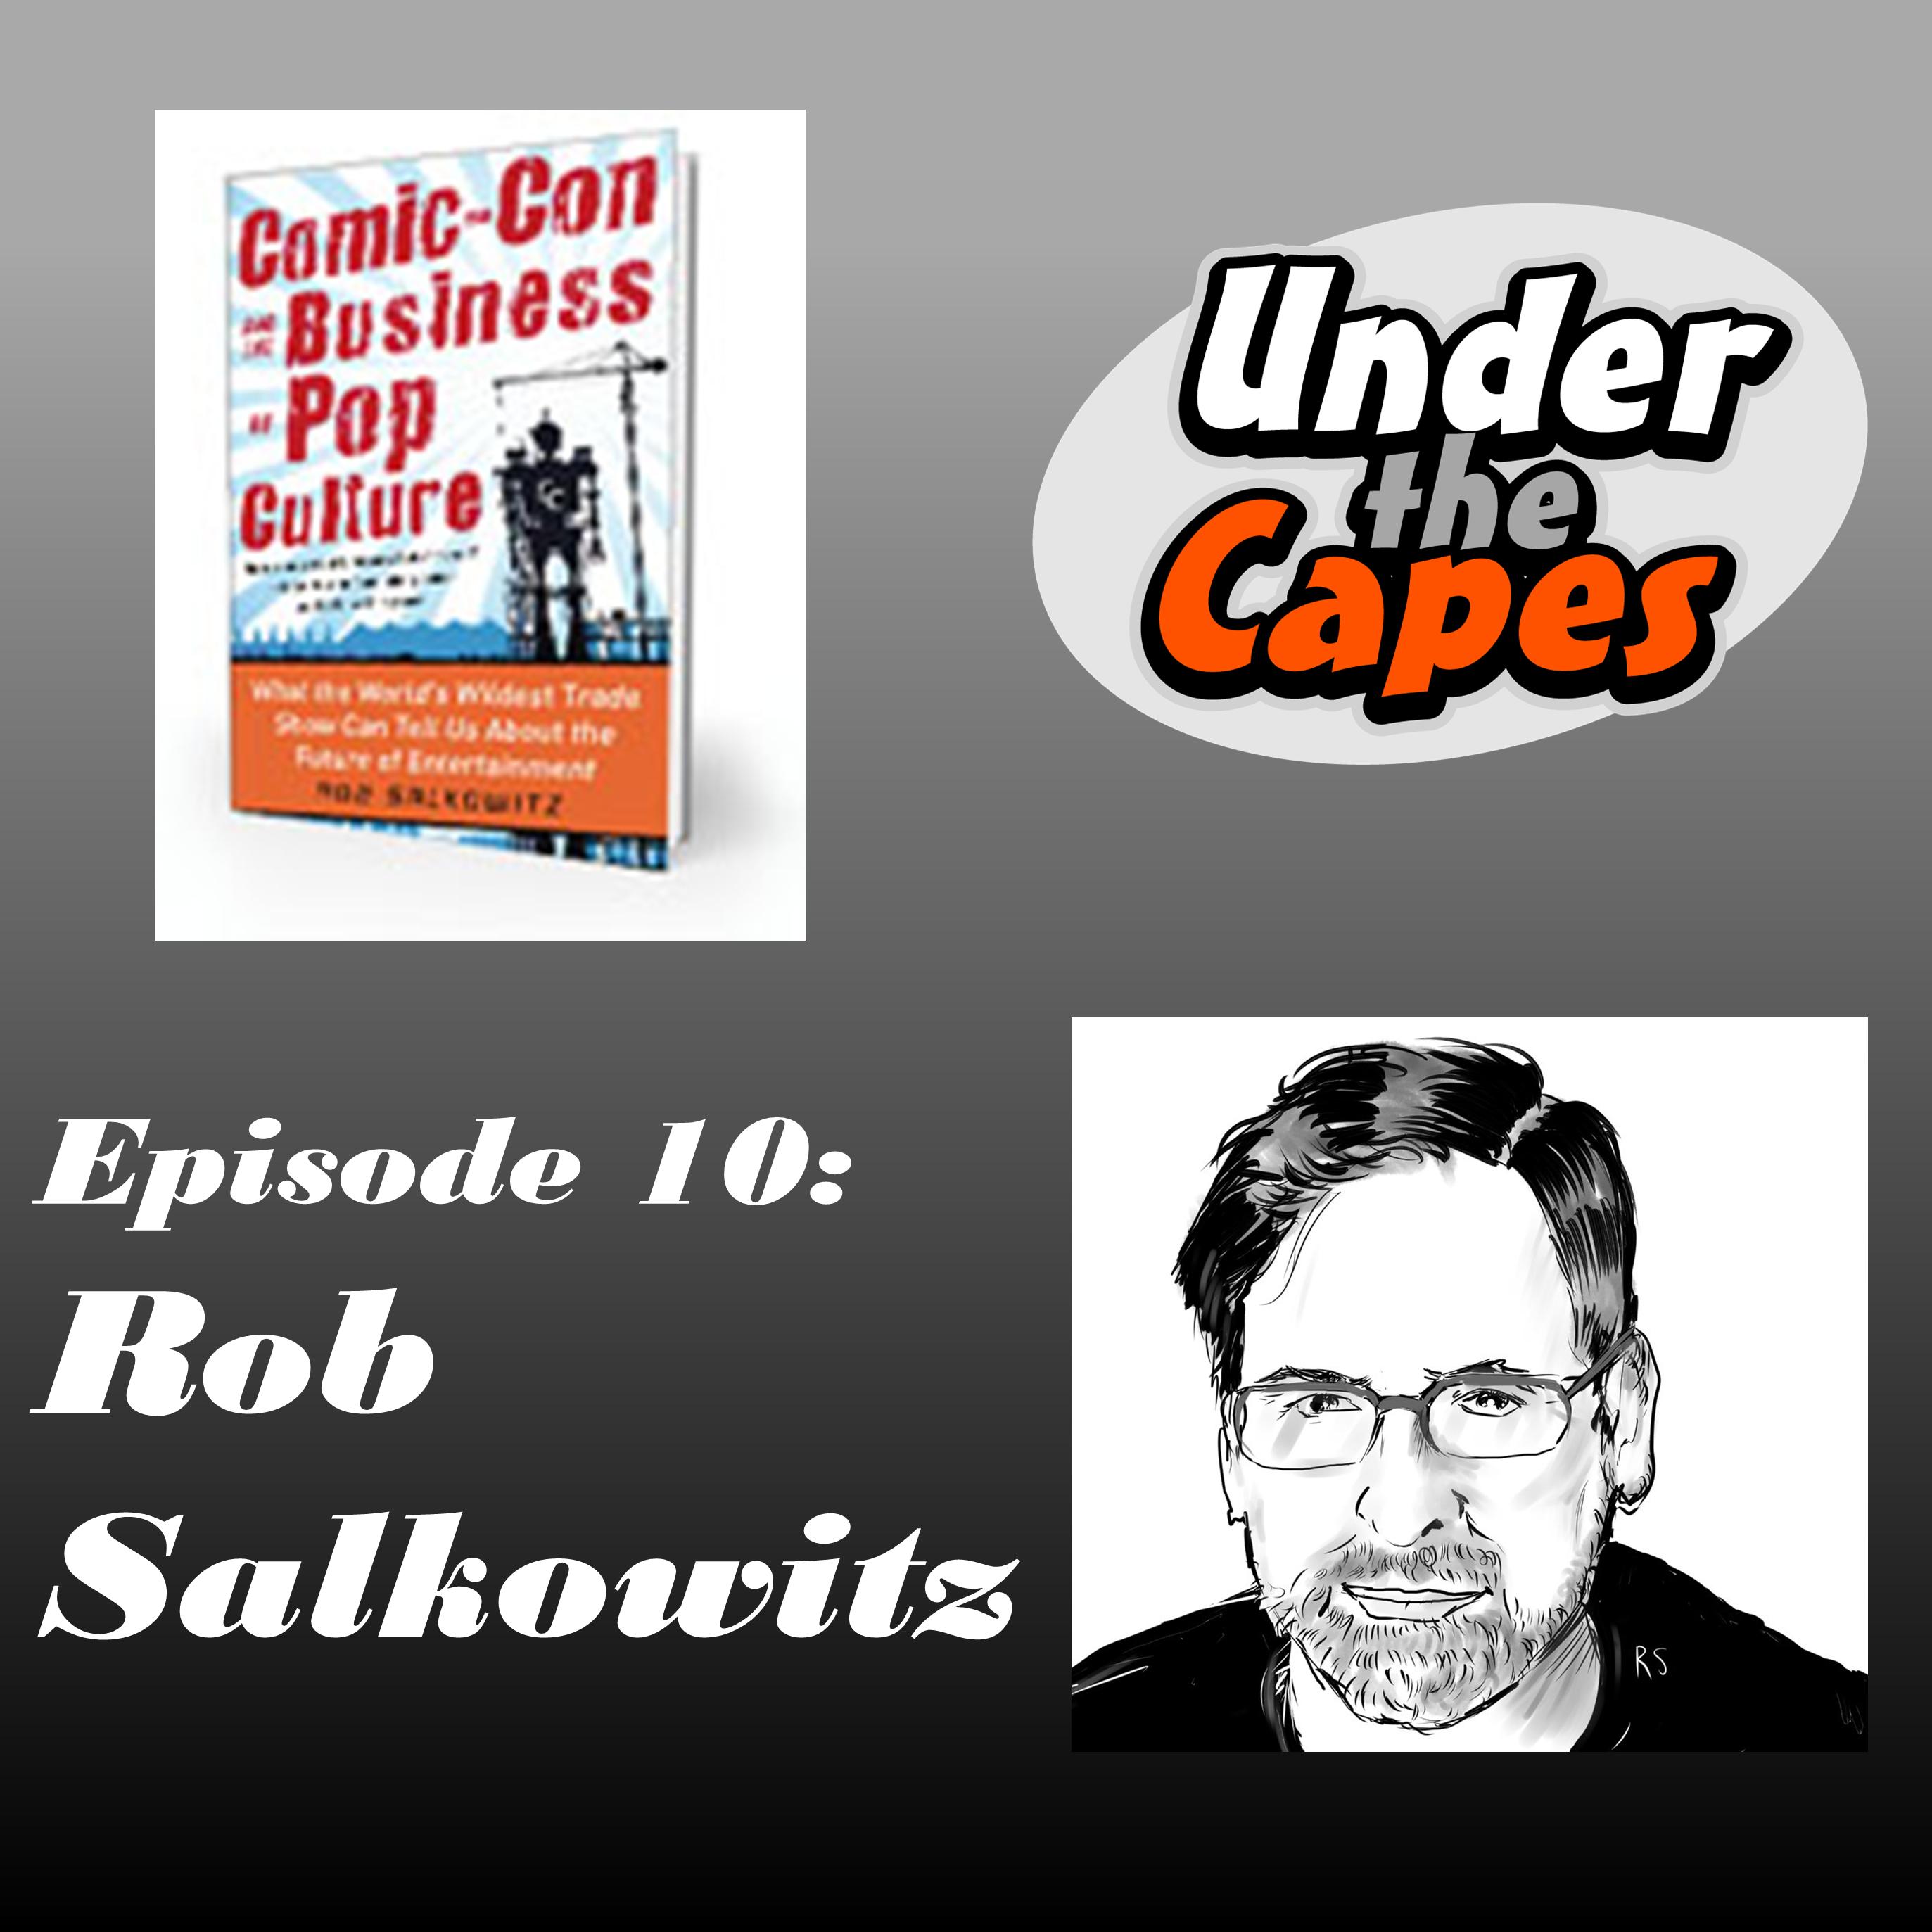 Episode 10: Rob Salkowitz